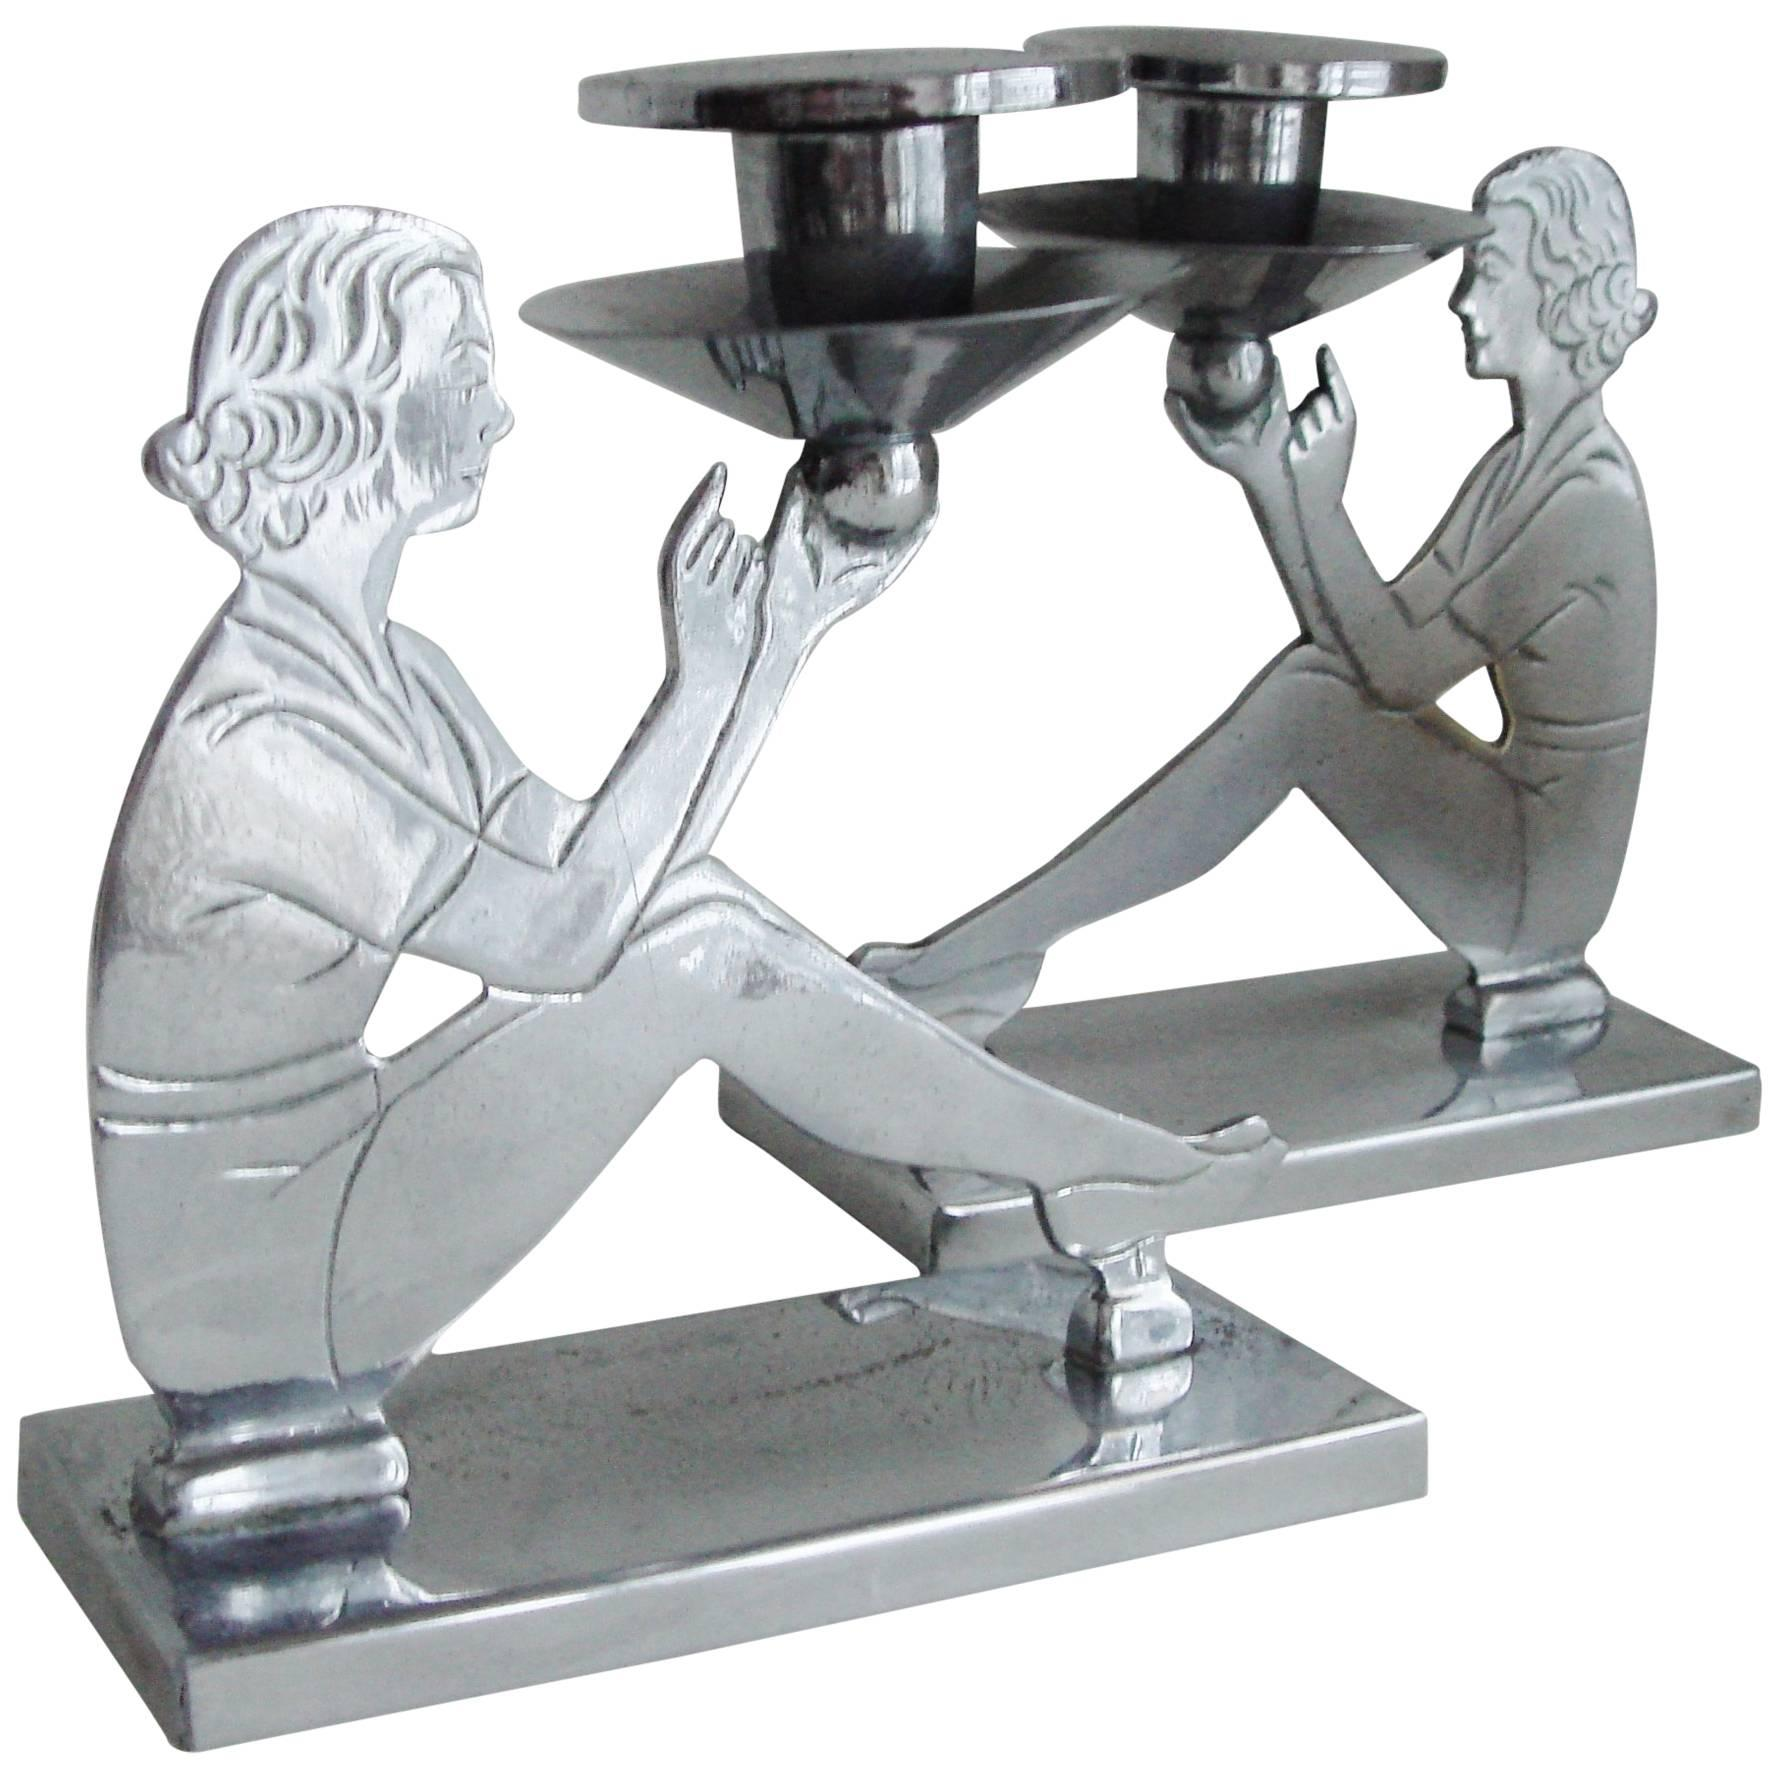 Pair of English Art Deco Chrome Figurative Seated Female Candlesticks